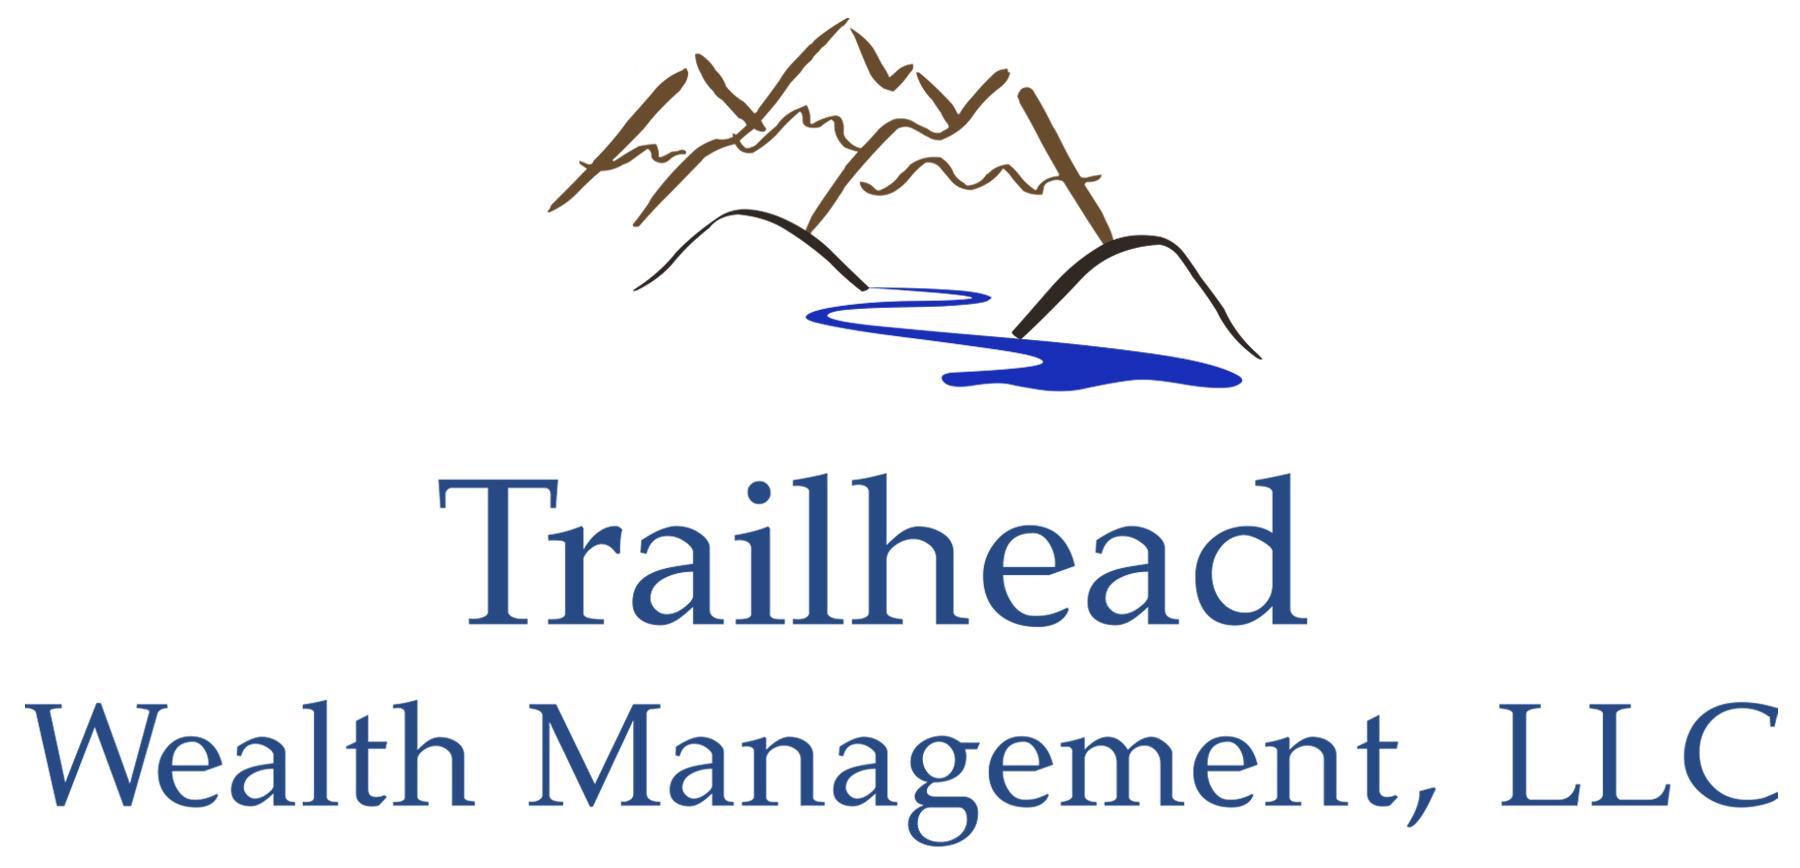 Trailhead WM_jpg.jpg